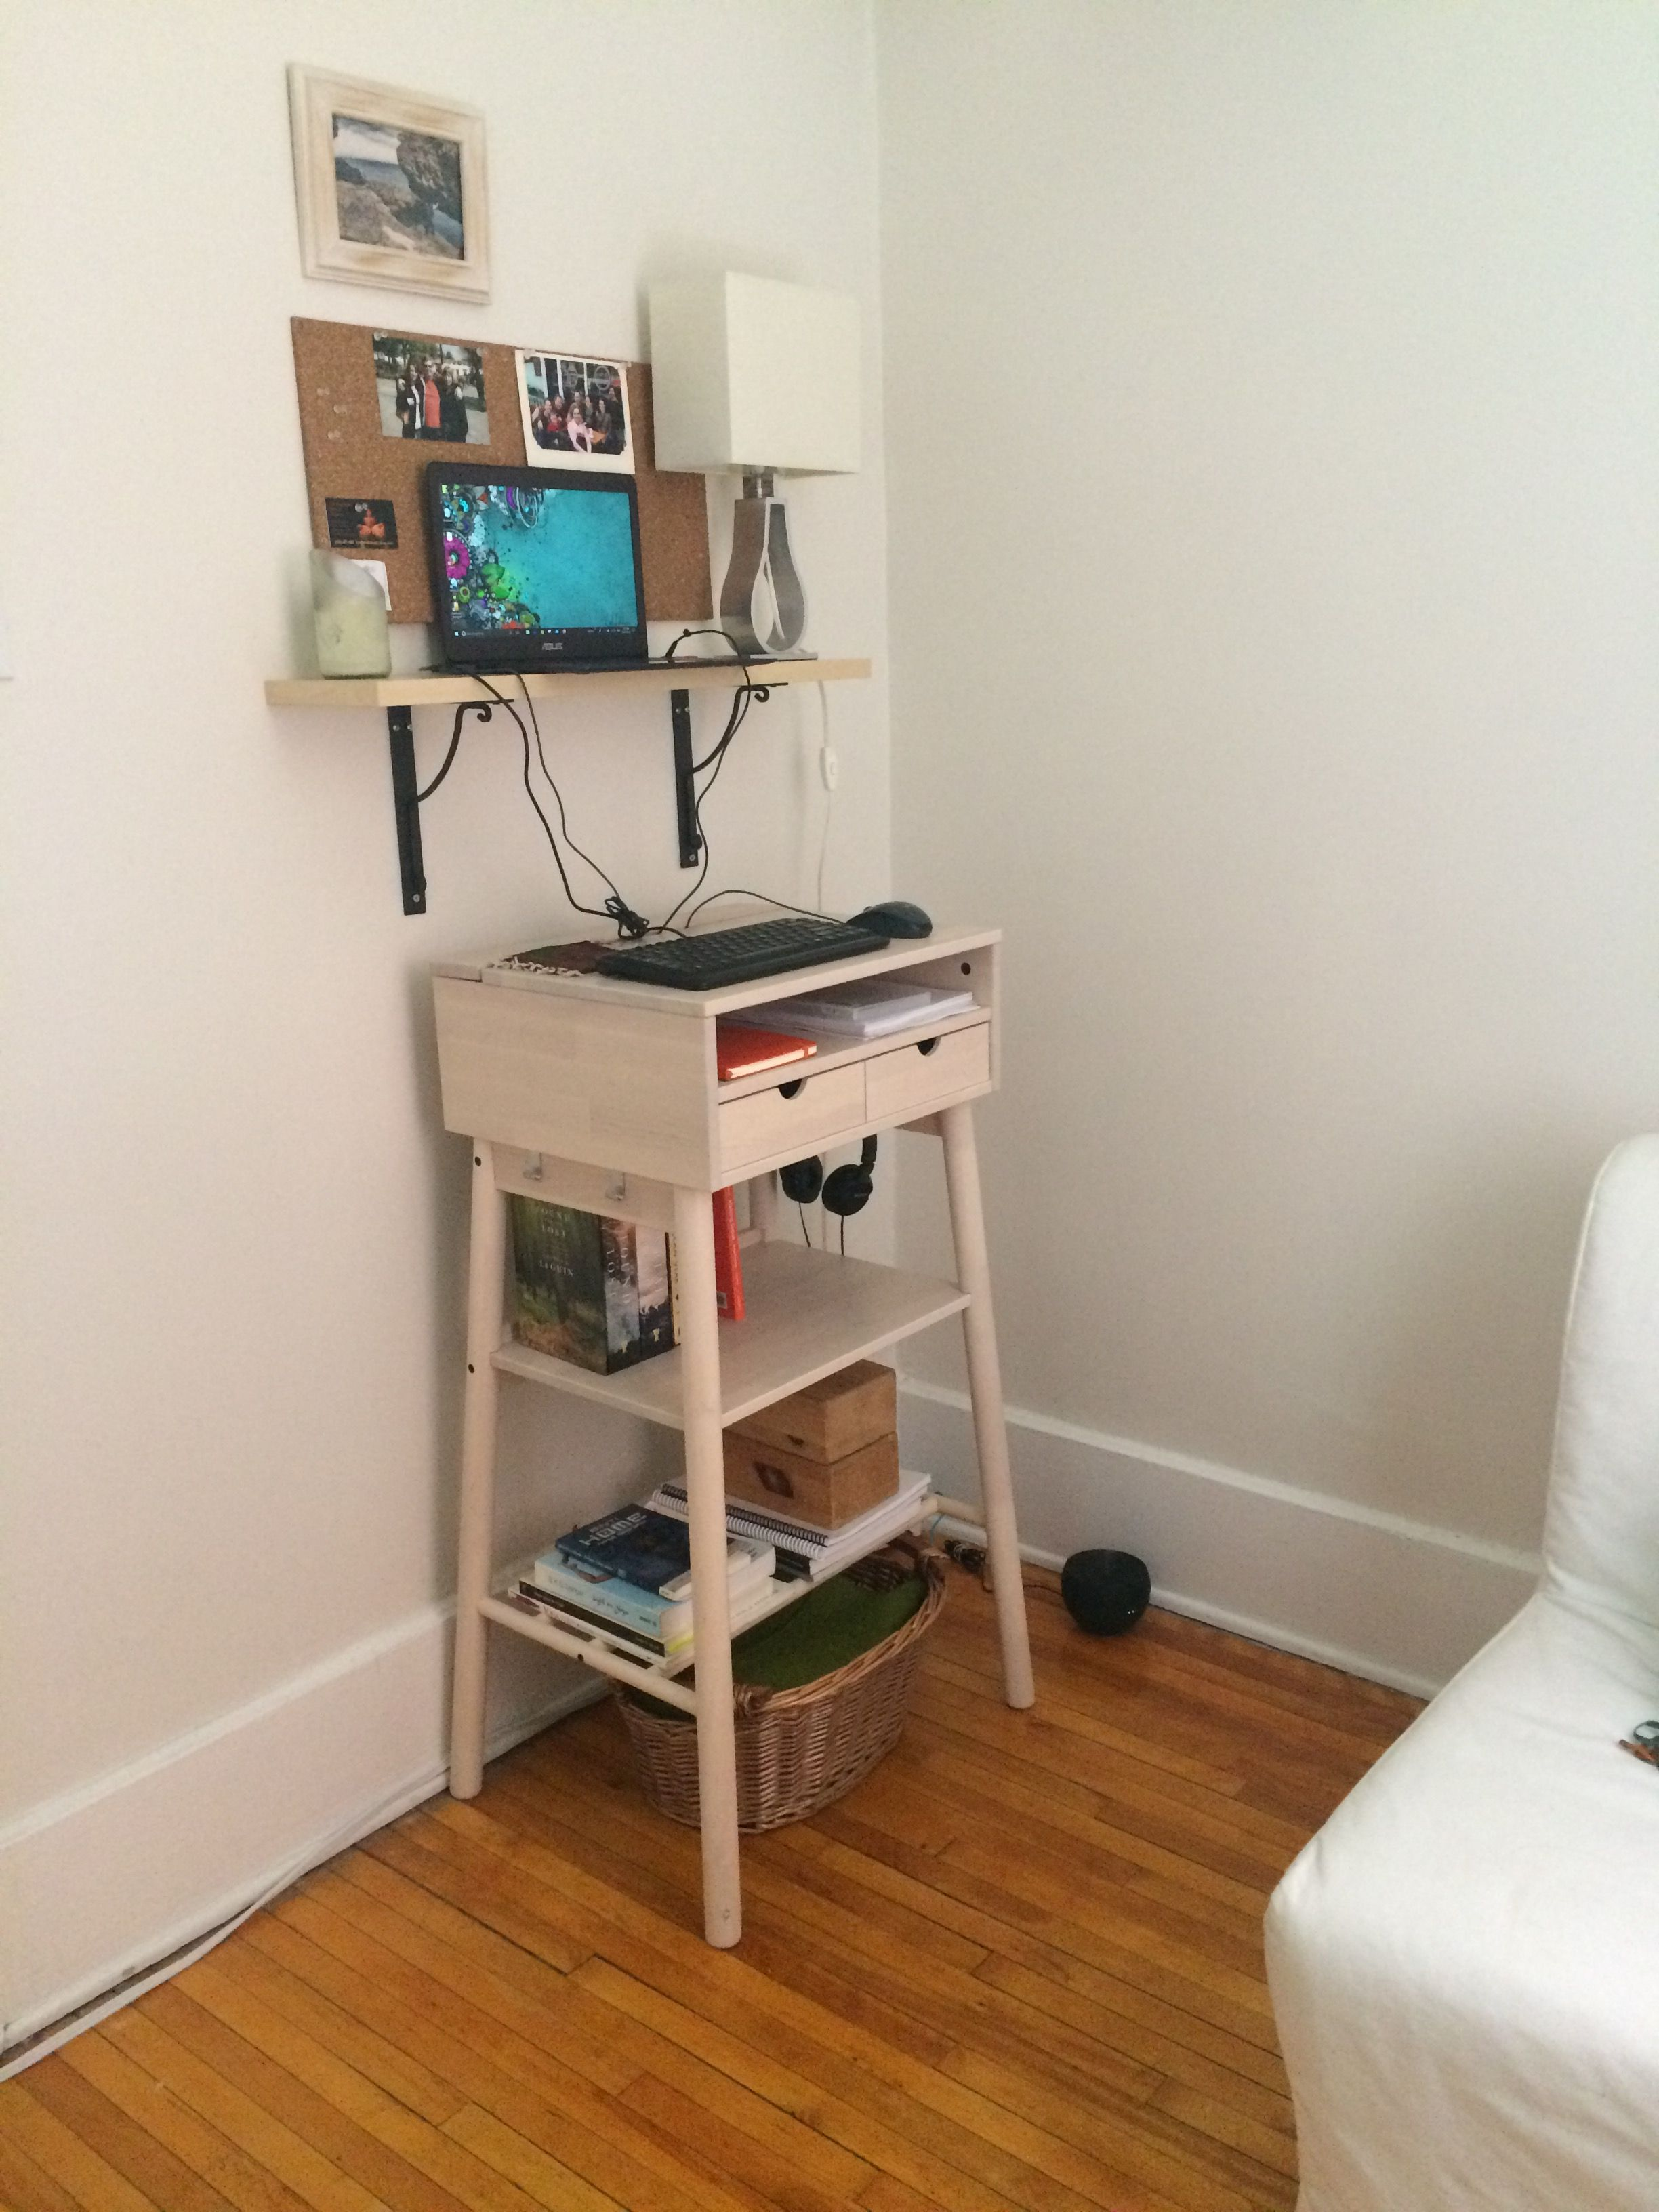 Ergonomic Desk Ikea Knotten Standing Desk With Floating Shelf For Laptop Because I Am 5 4 The Desk Is Too High So I S Ikea Standing Desk Ergonomic Desk Desk